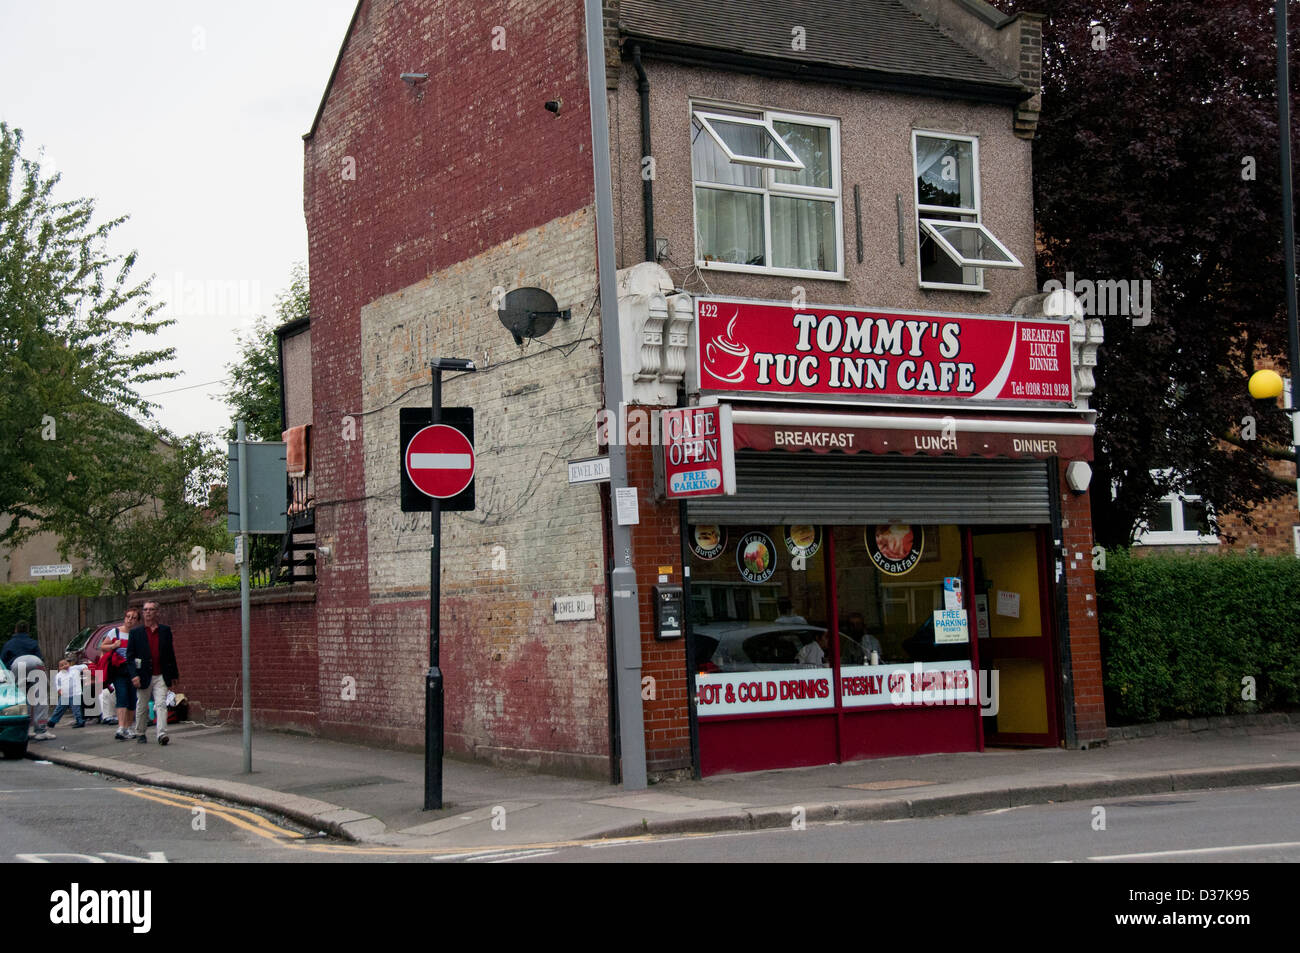 Altmodische Corner Cafe in Nord-London Stockbild